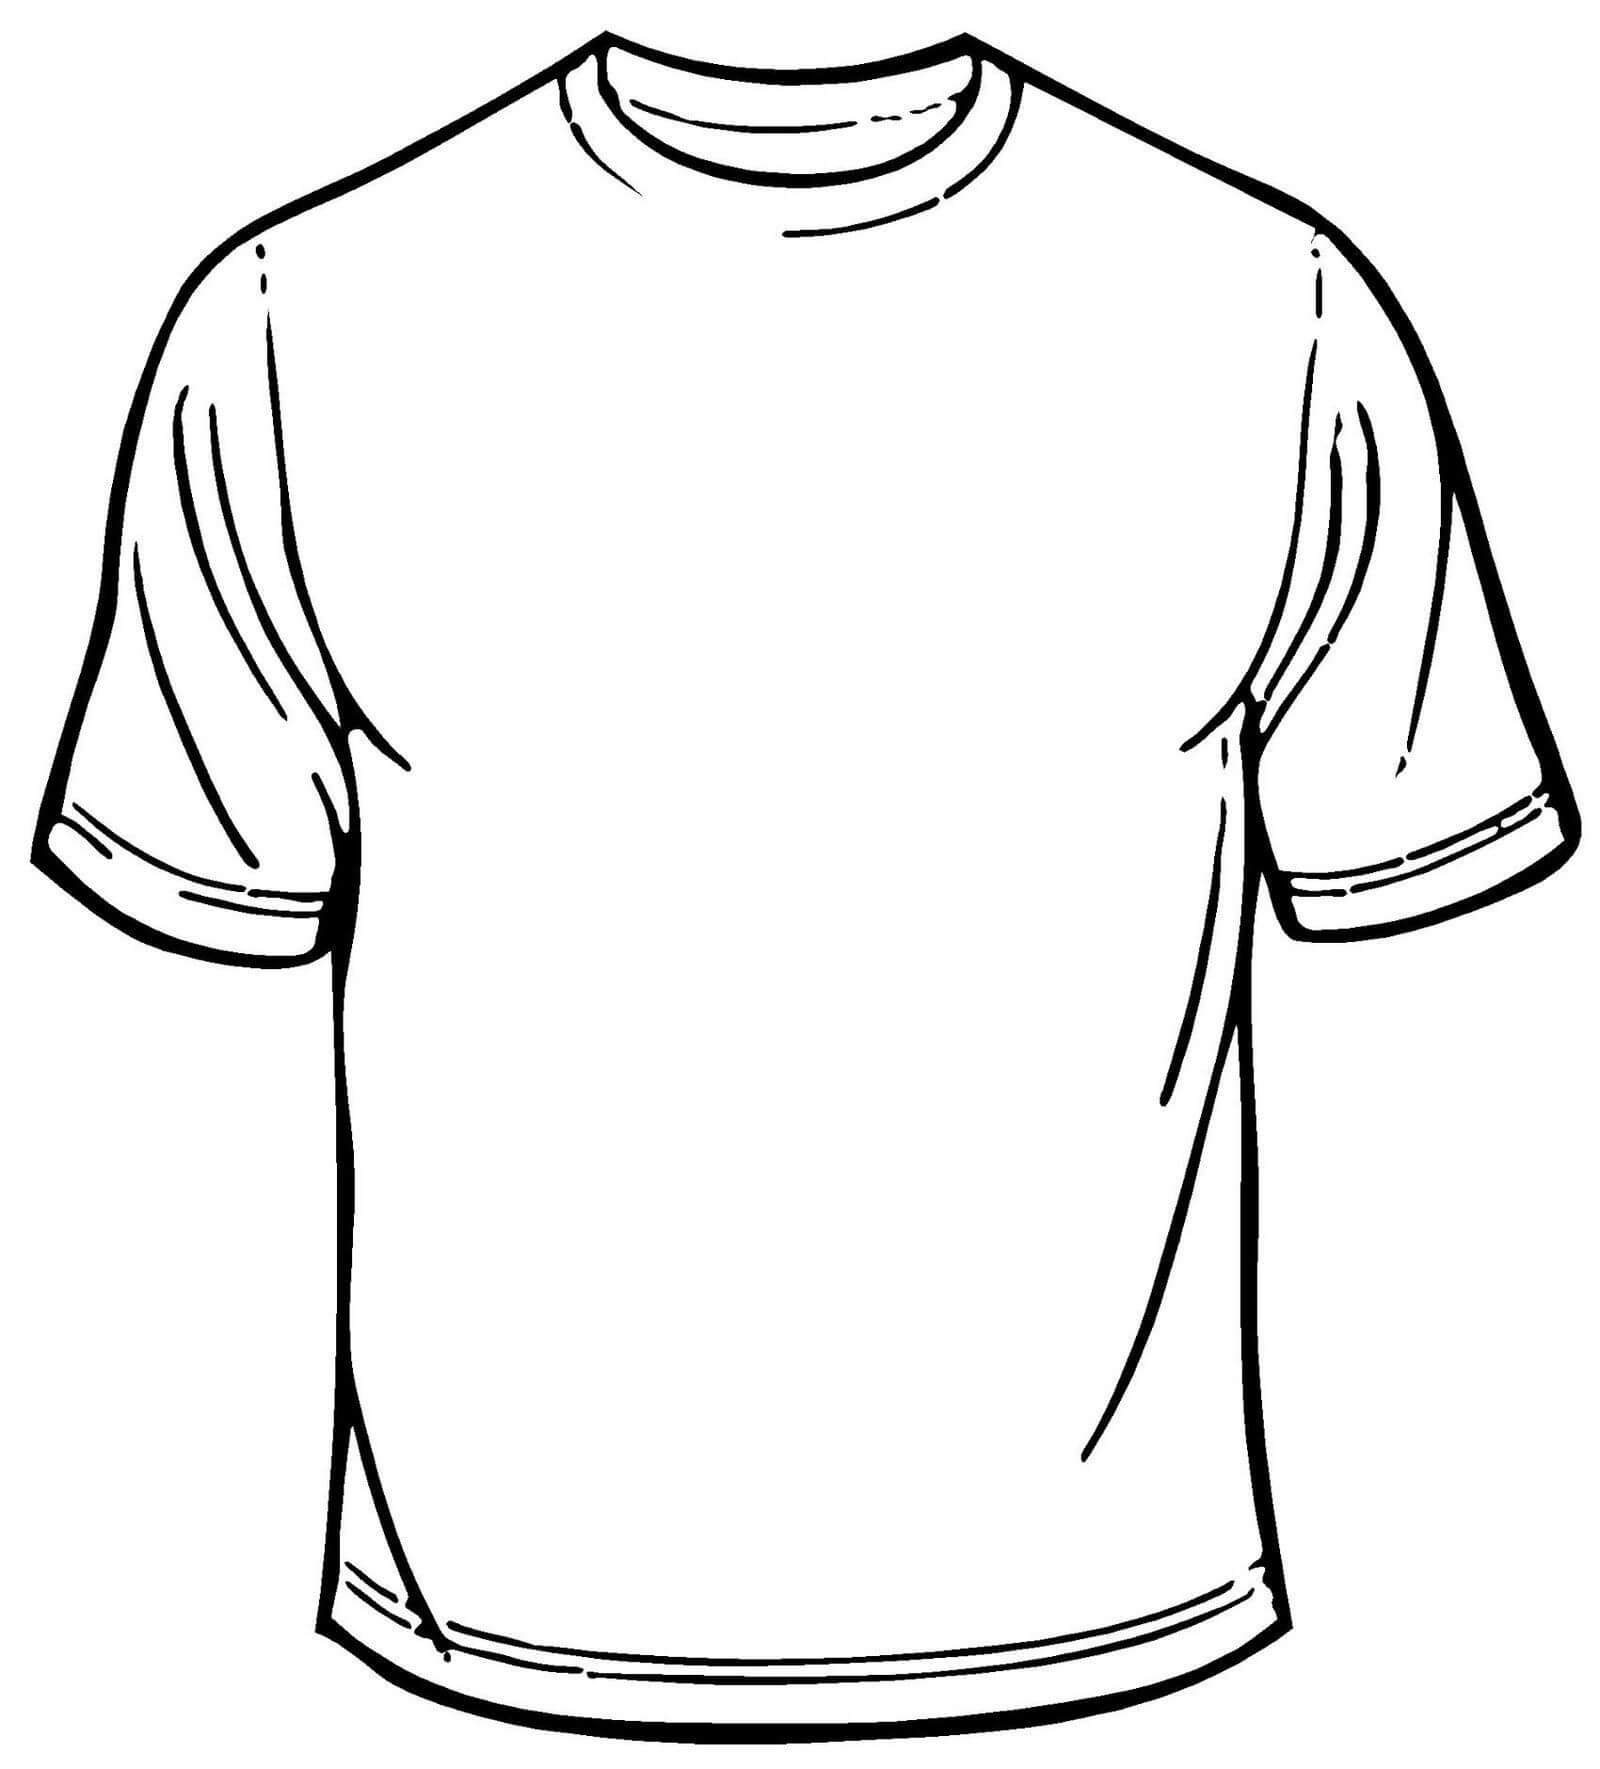 Blank T Shirt Coloring Sheet Printable   T Shirt Coloring throughout Blank Tshirt Template Printable